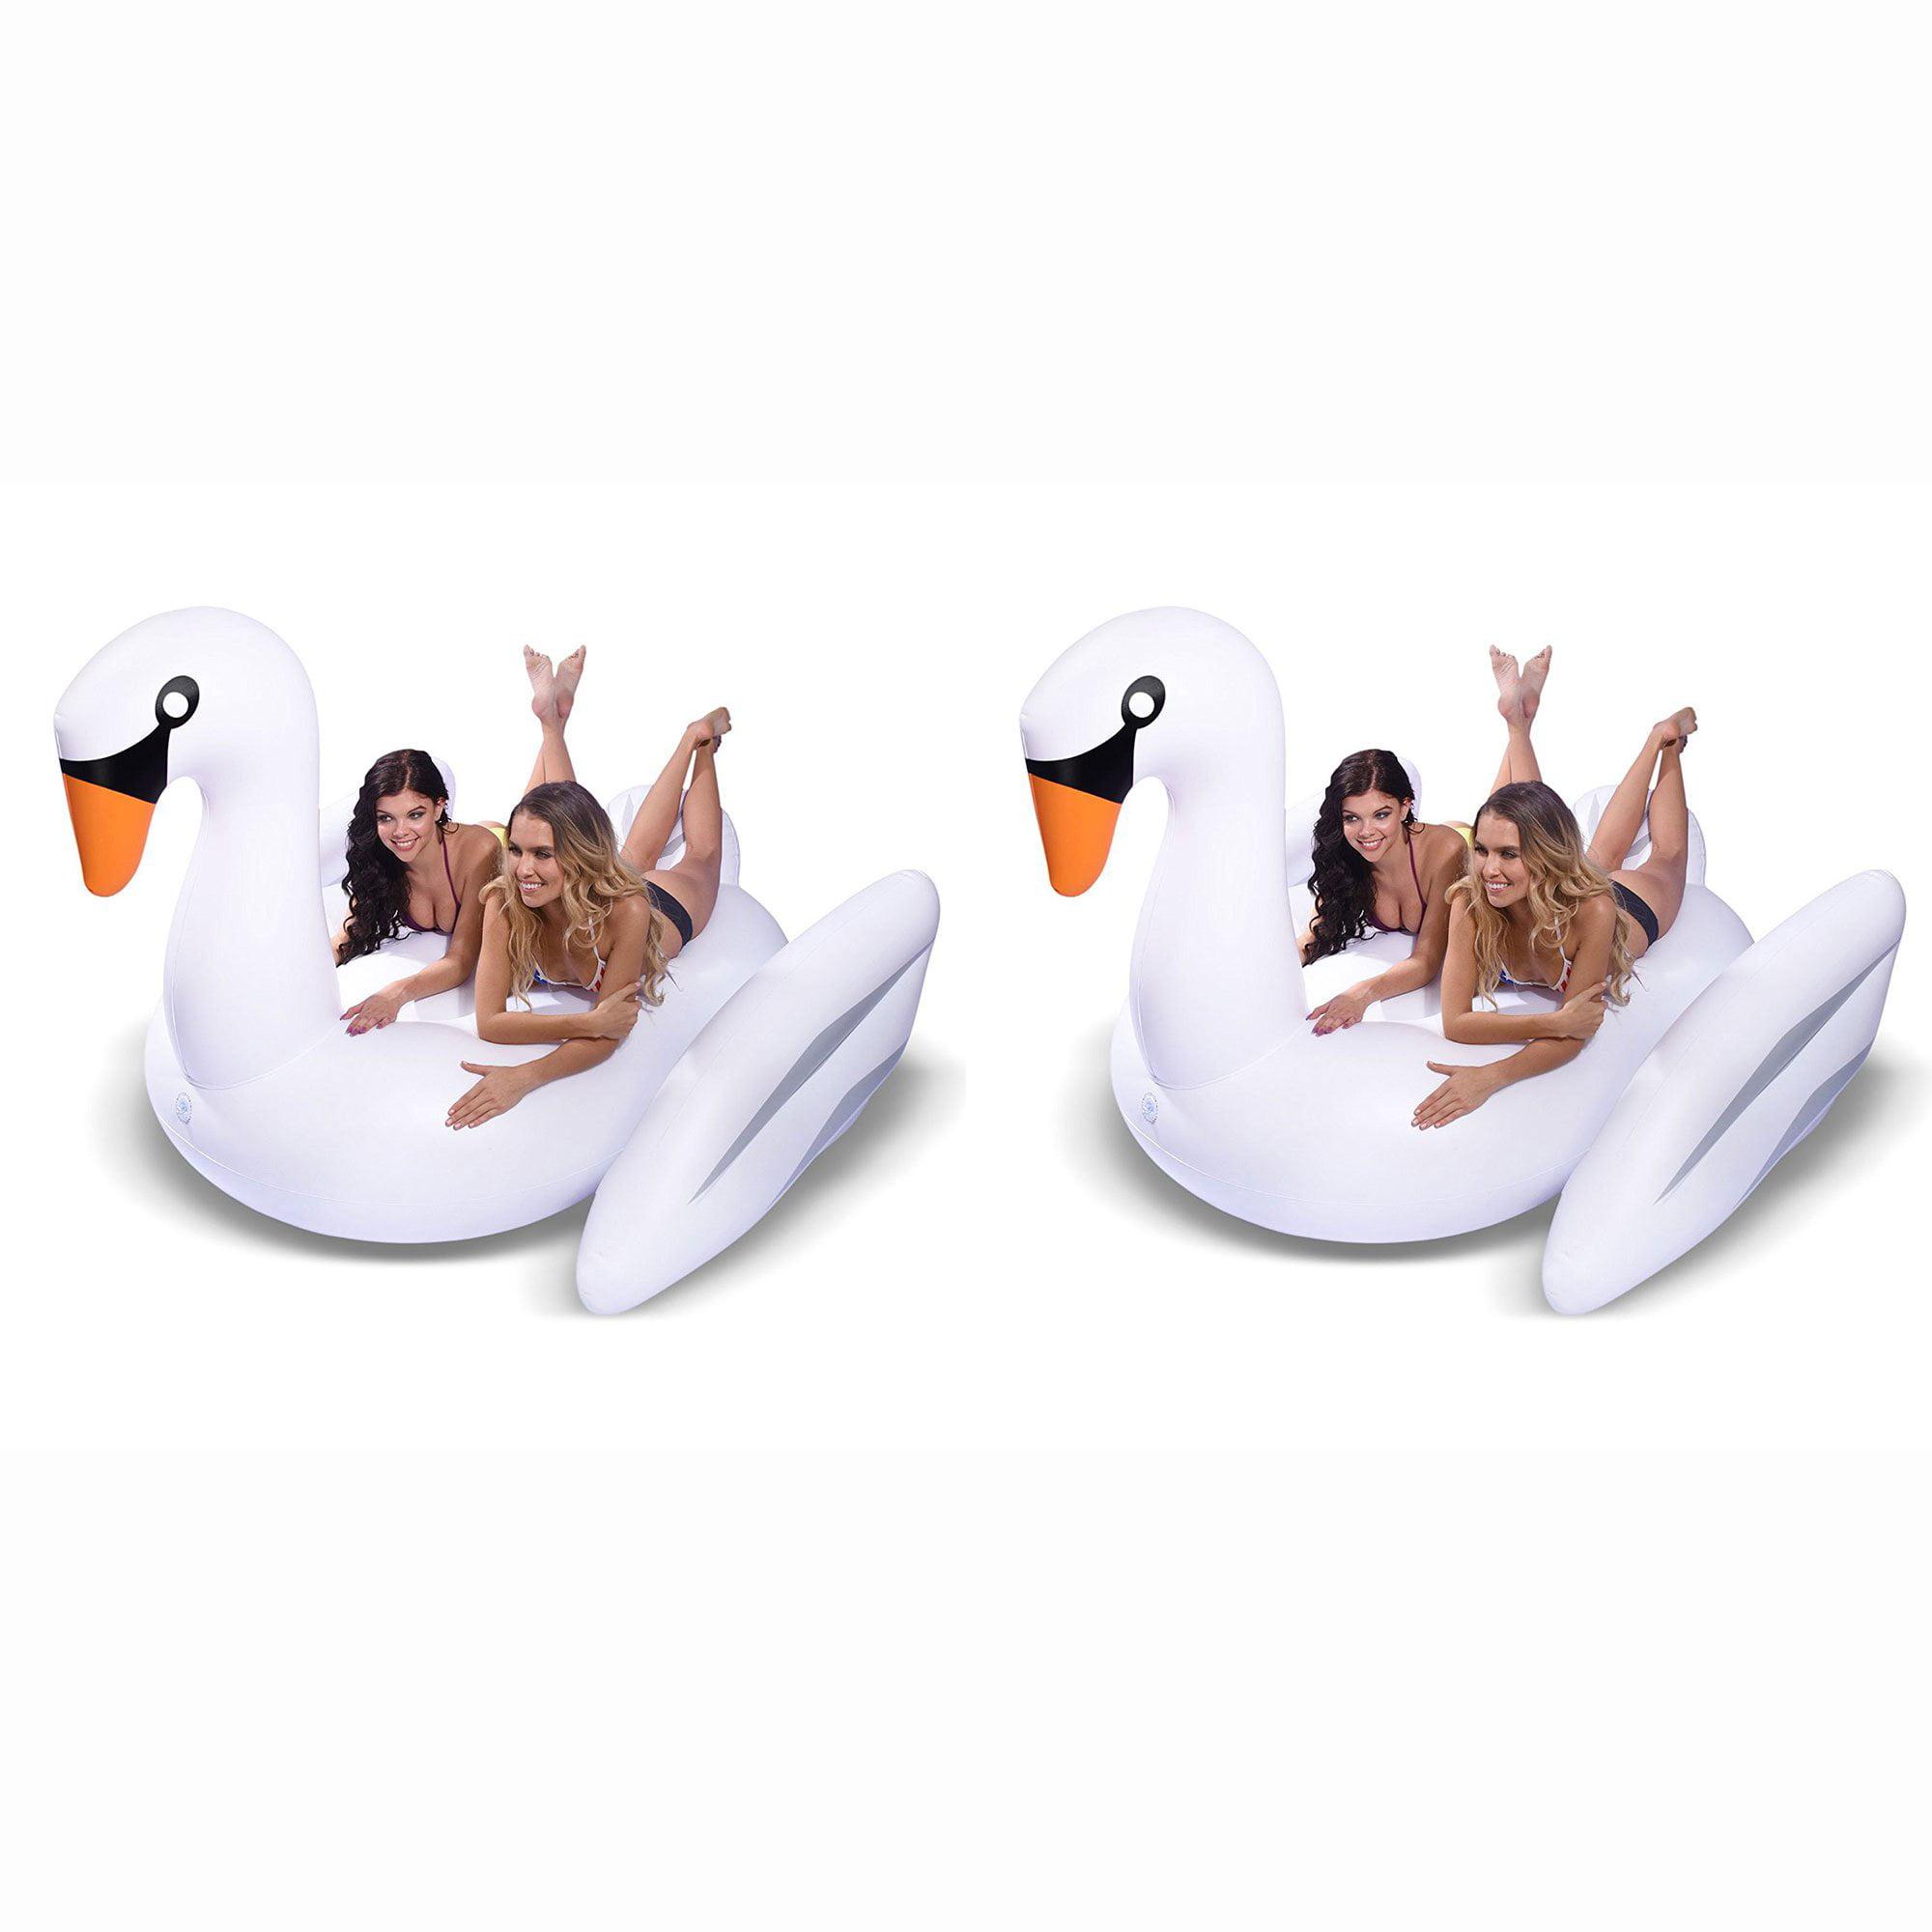 GoFloats Giant Inflatable Voyage Swan Pool Lake Water Float Raft, White (2 Pack)